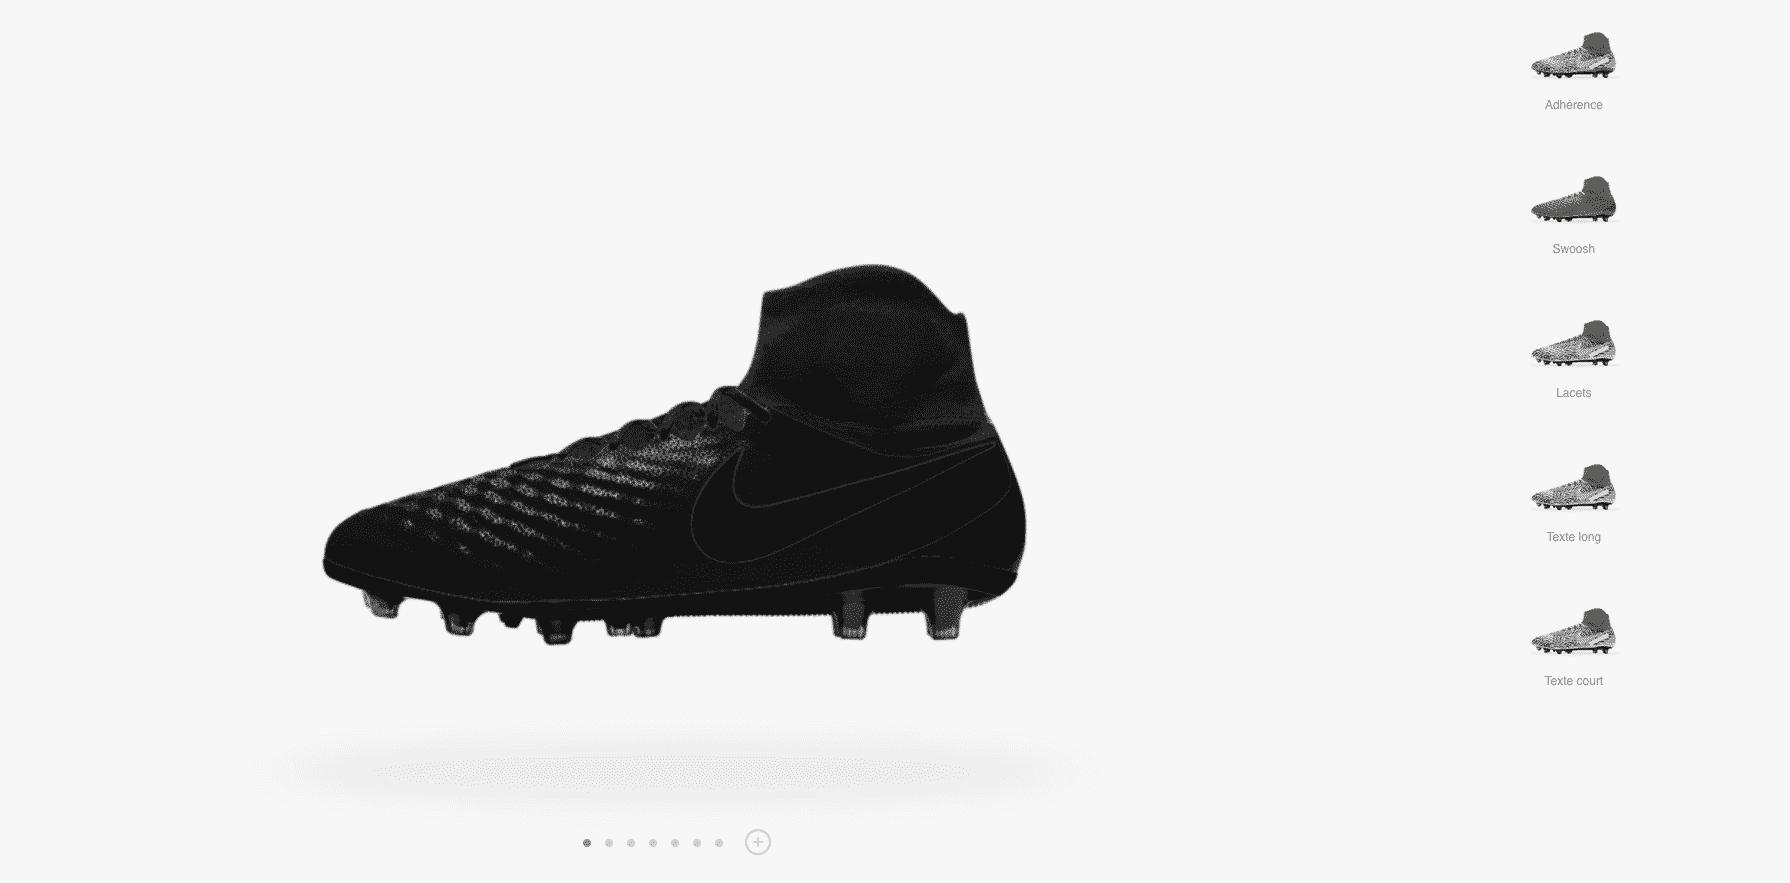 huge selection of 16243 a14e0 chaussure-football-nike-tech-craft-id-img2 ...